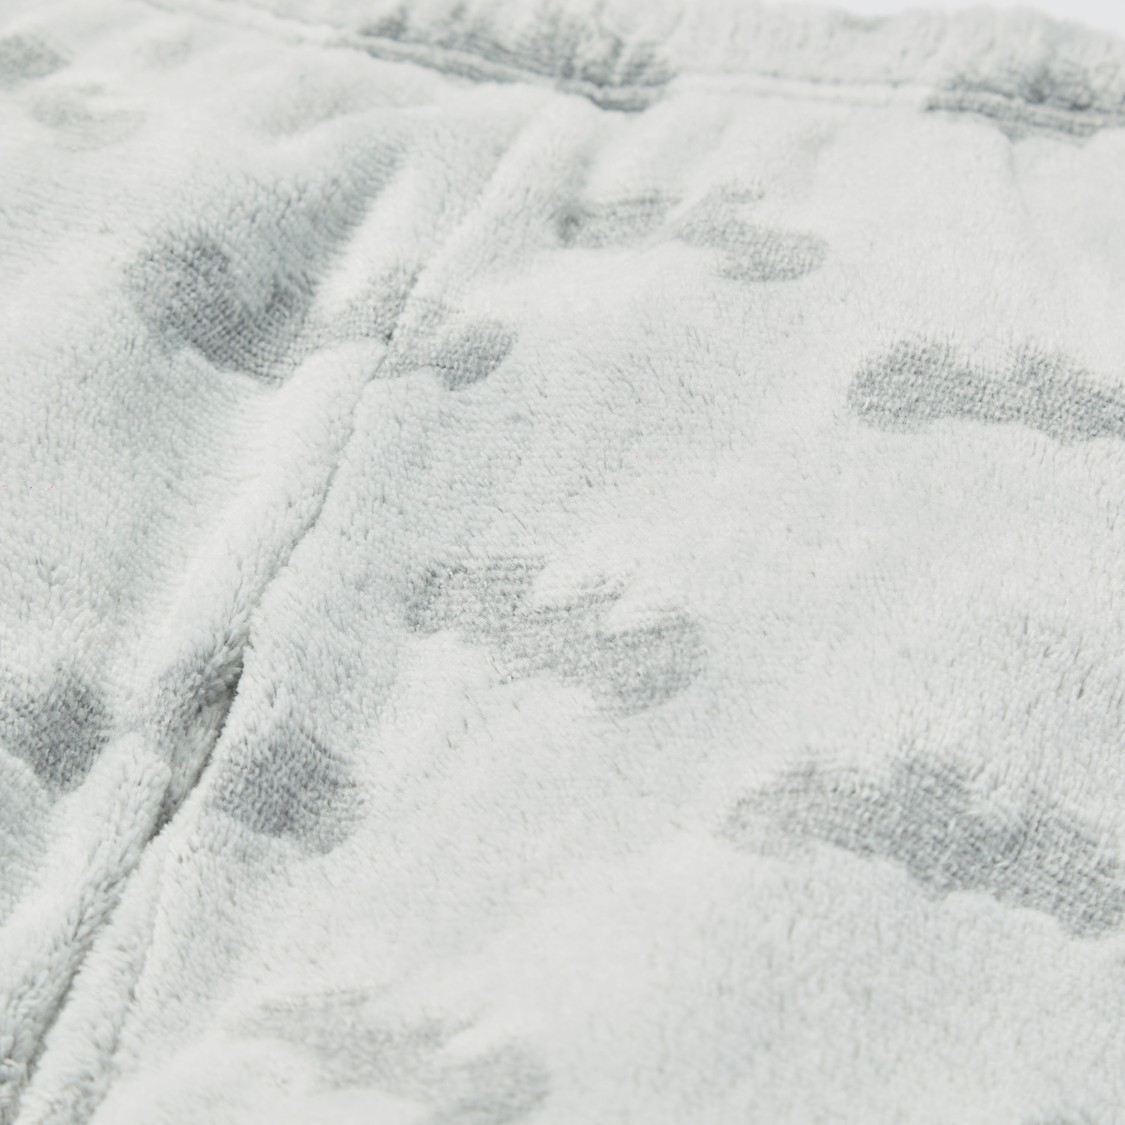 Batman Textured Long Sleeves T-shirt and Full Length Pyjama Set